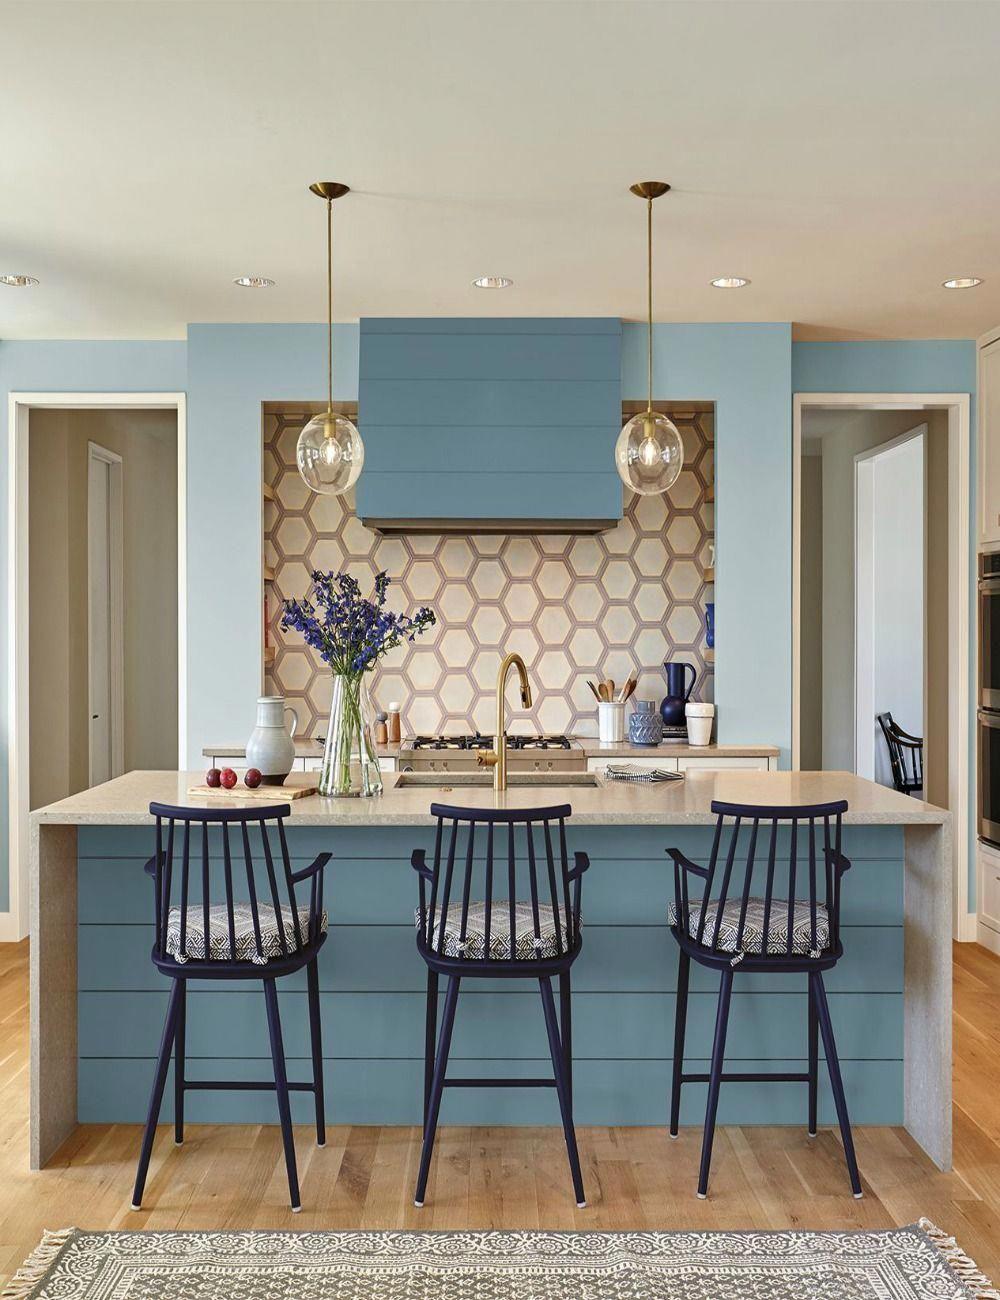 Kitchen Cabinets Painted With Behr Blueprint Homeinteriordesign Kitchen Paint Kitchen Colors Trending Paint Colors